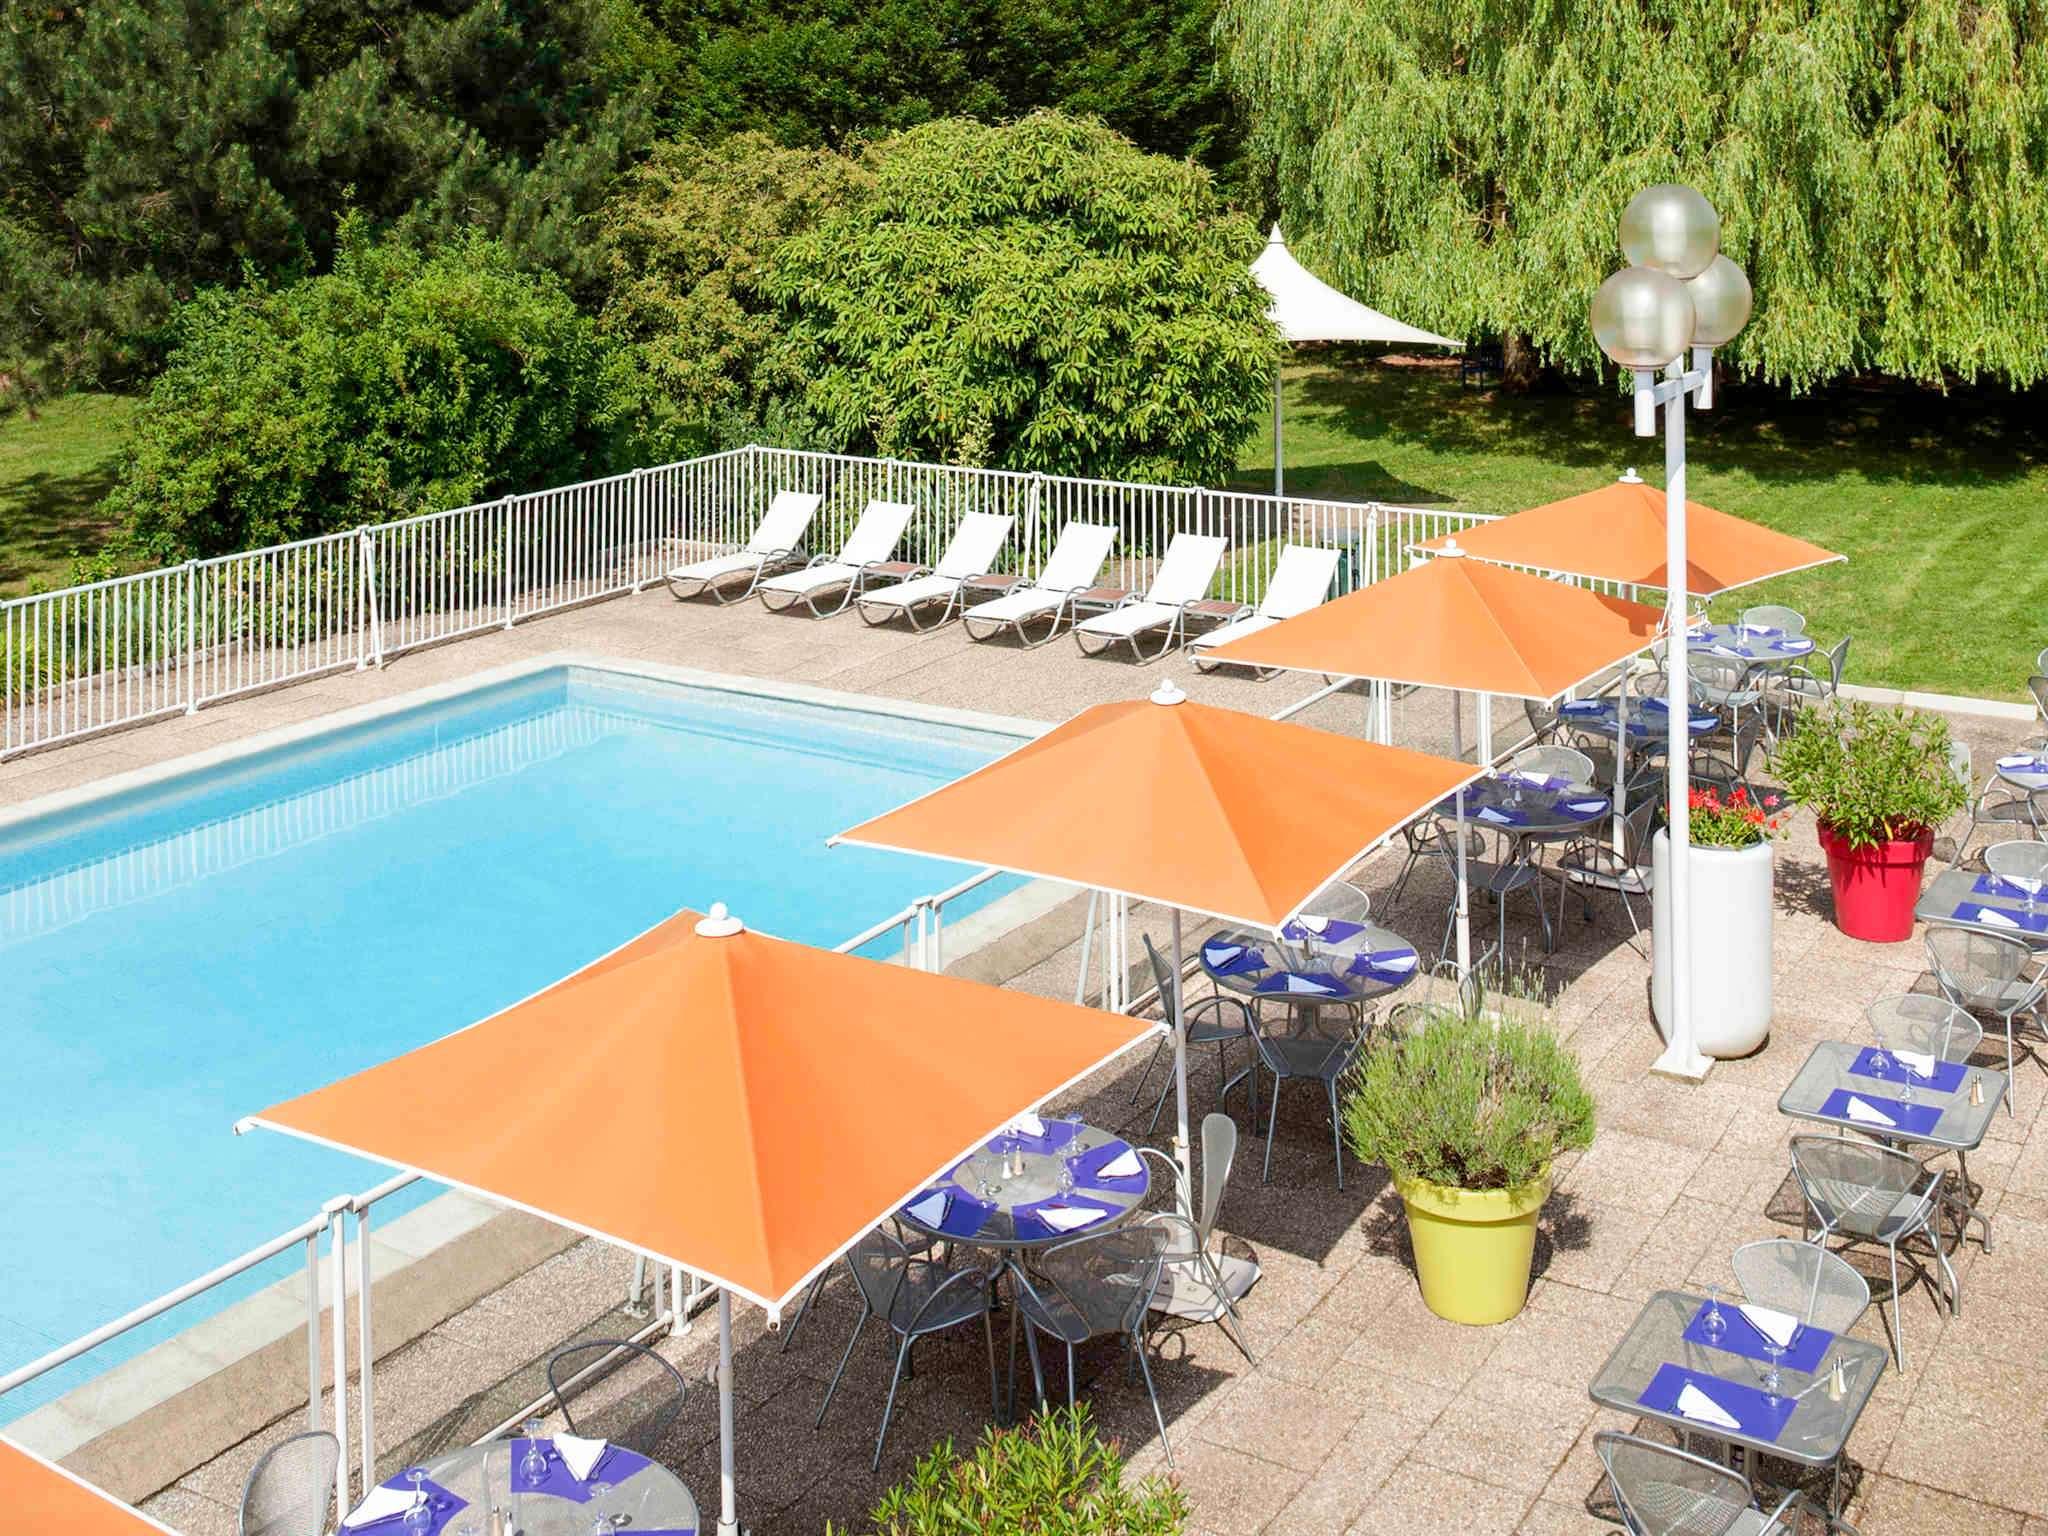 Hotel – Novotel Metz Hauconcourt